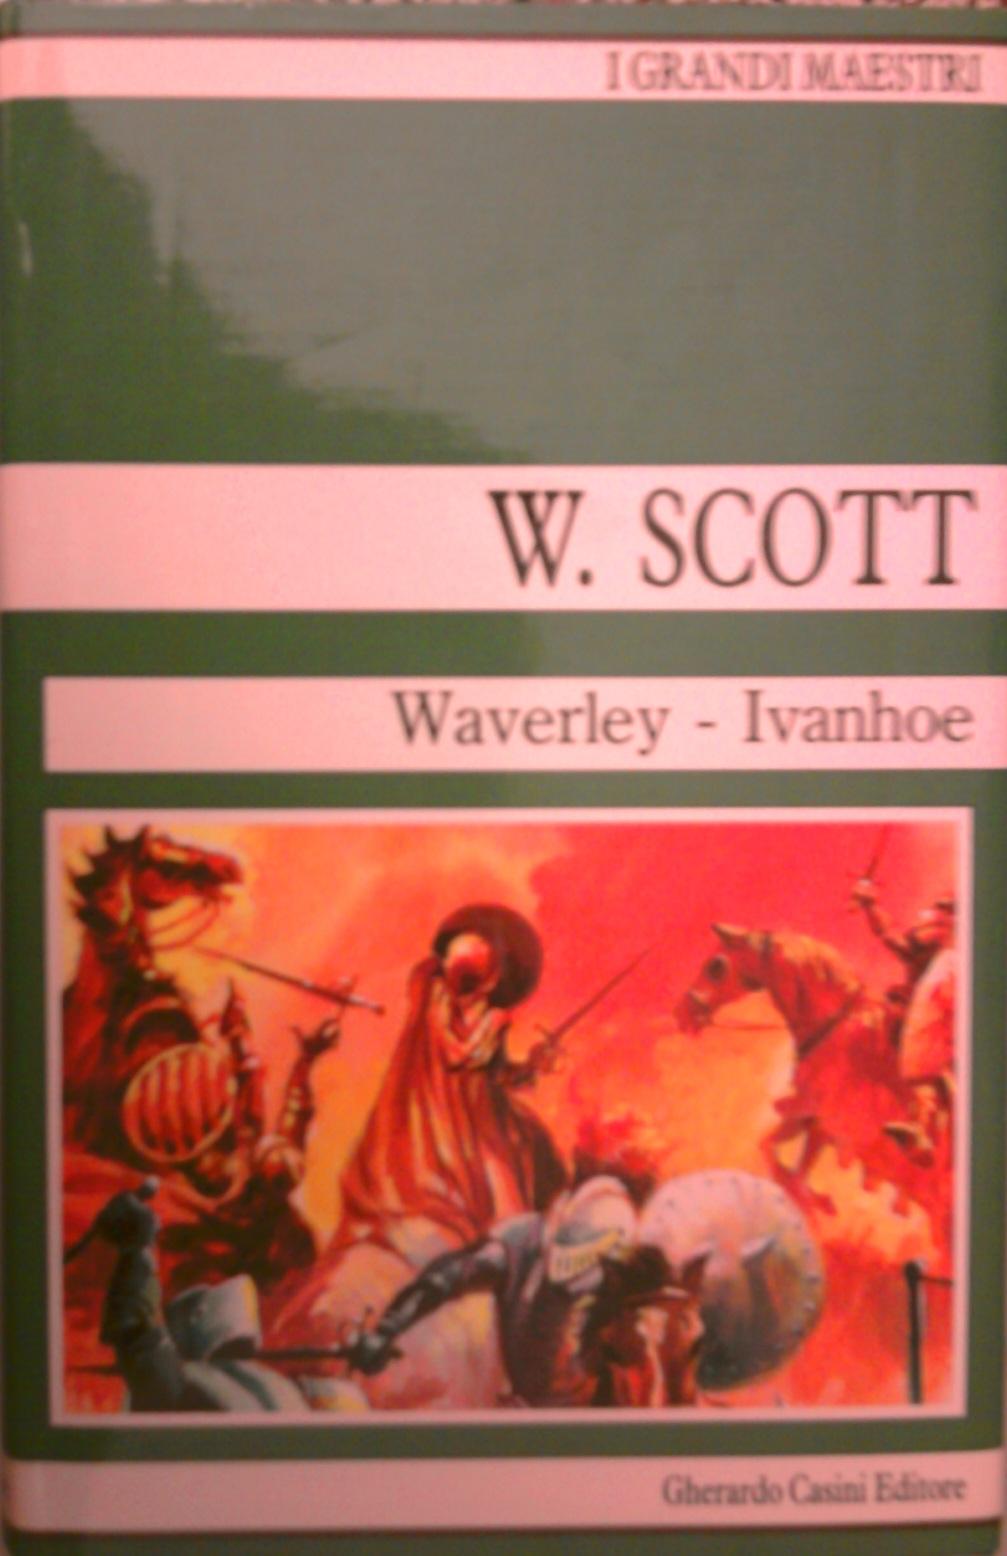 Waverly - Ivanhoe